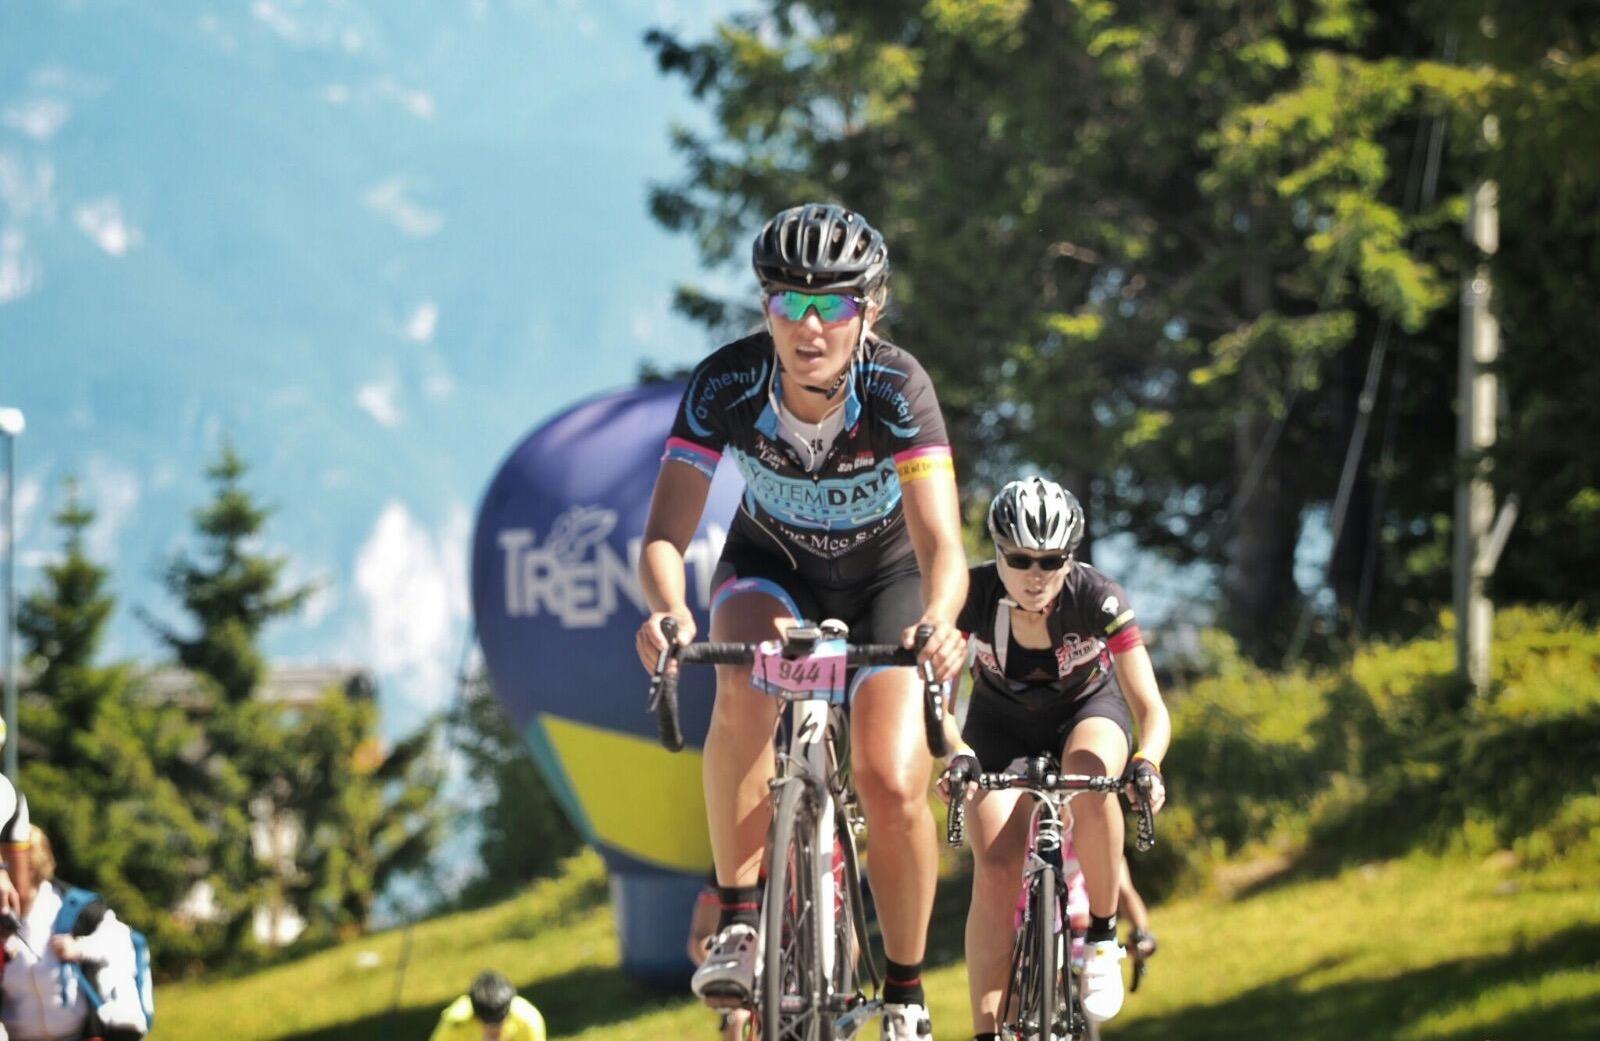 Cyclist racing a Gran Fondo